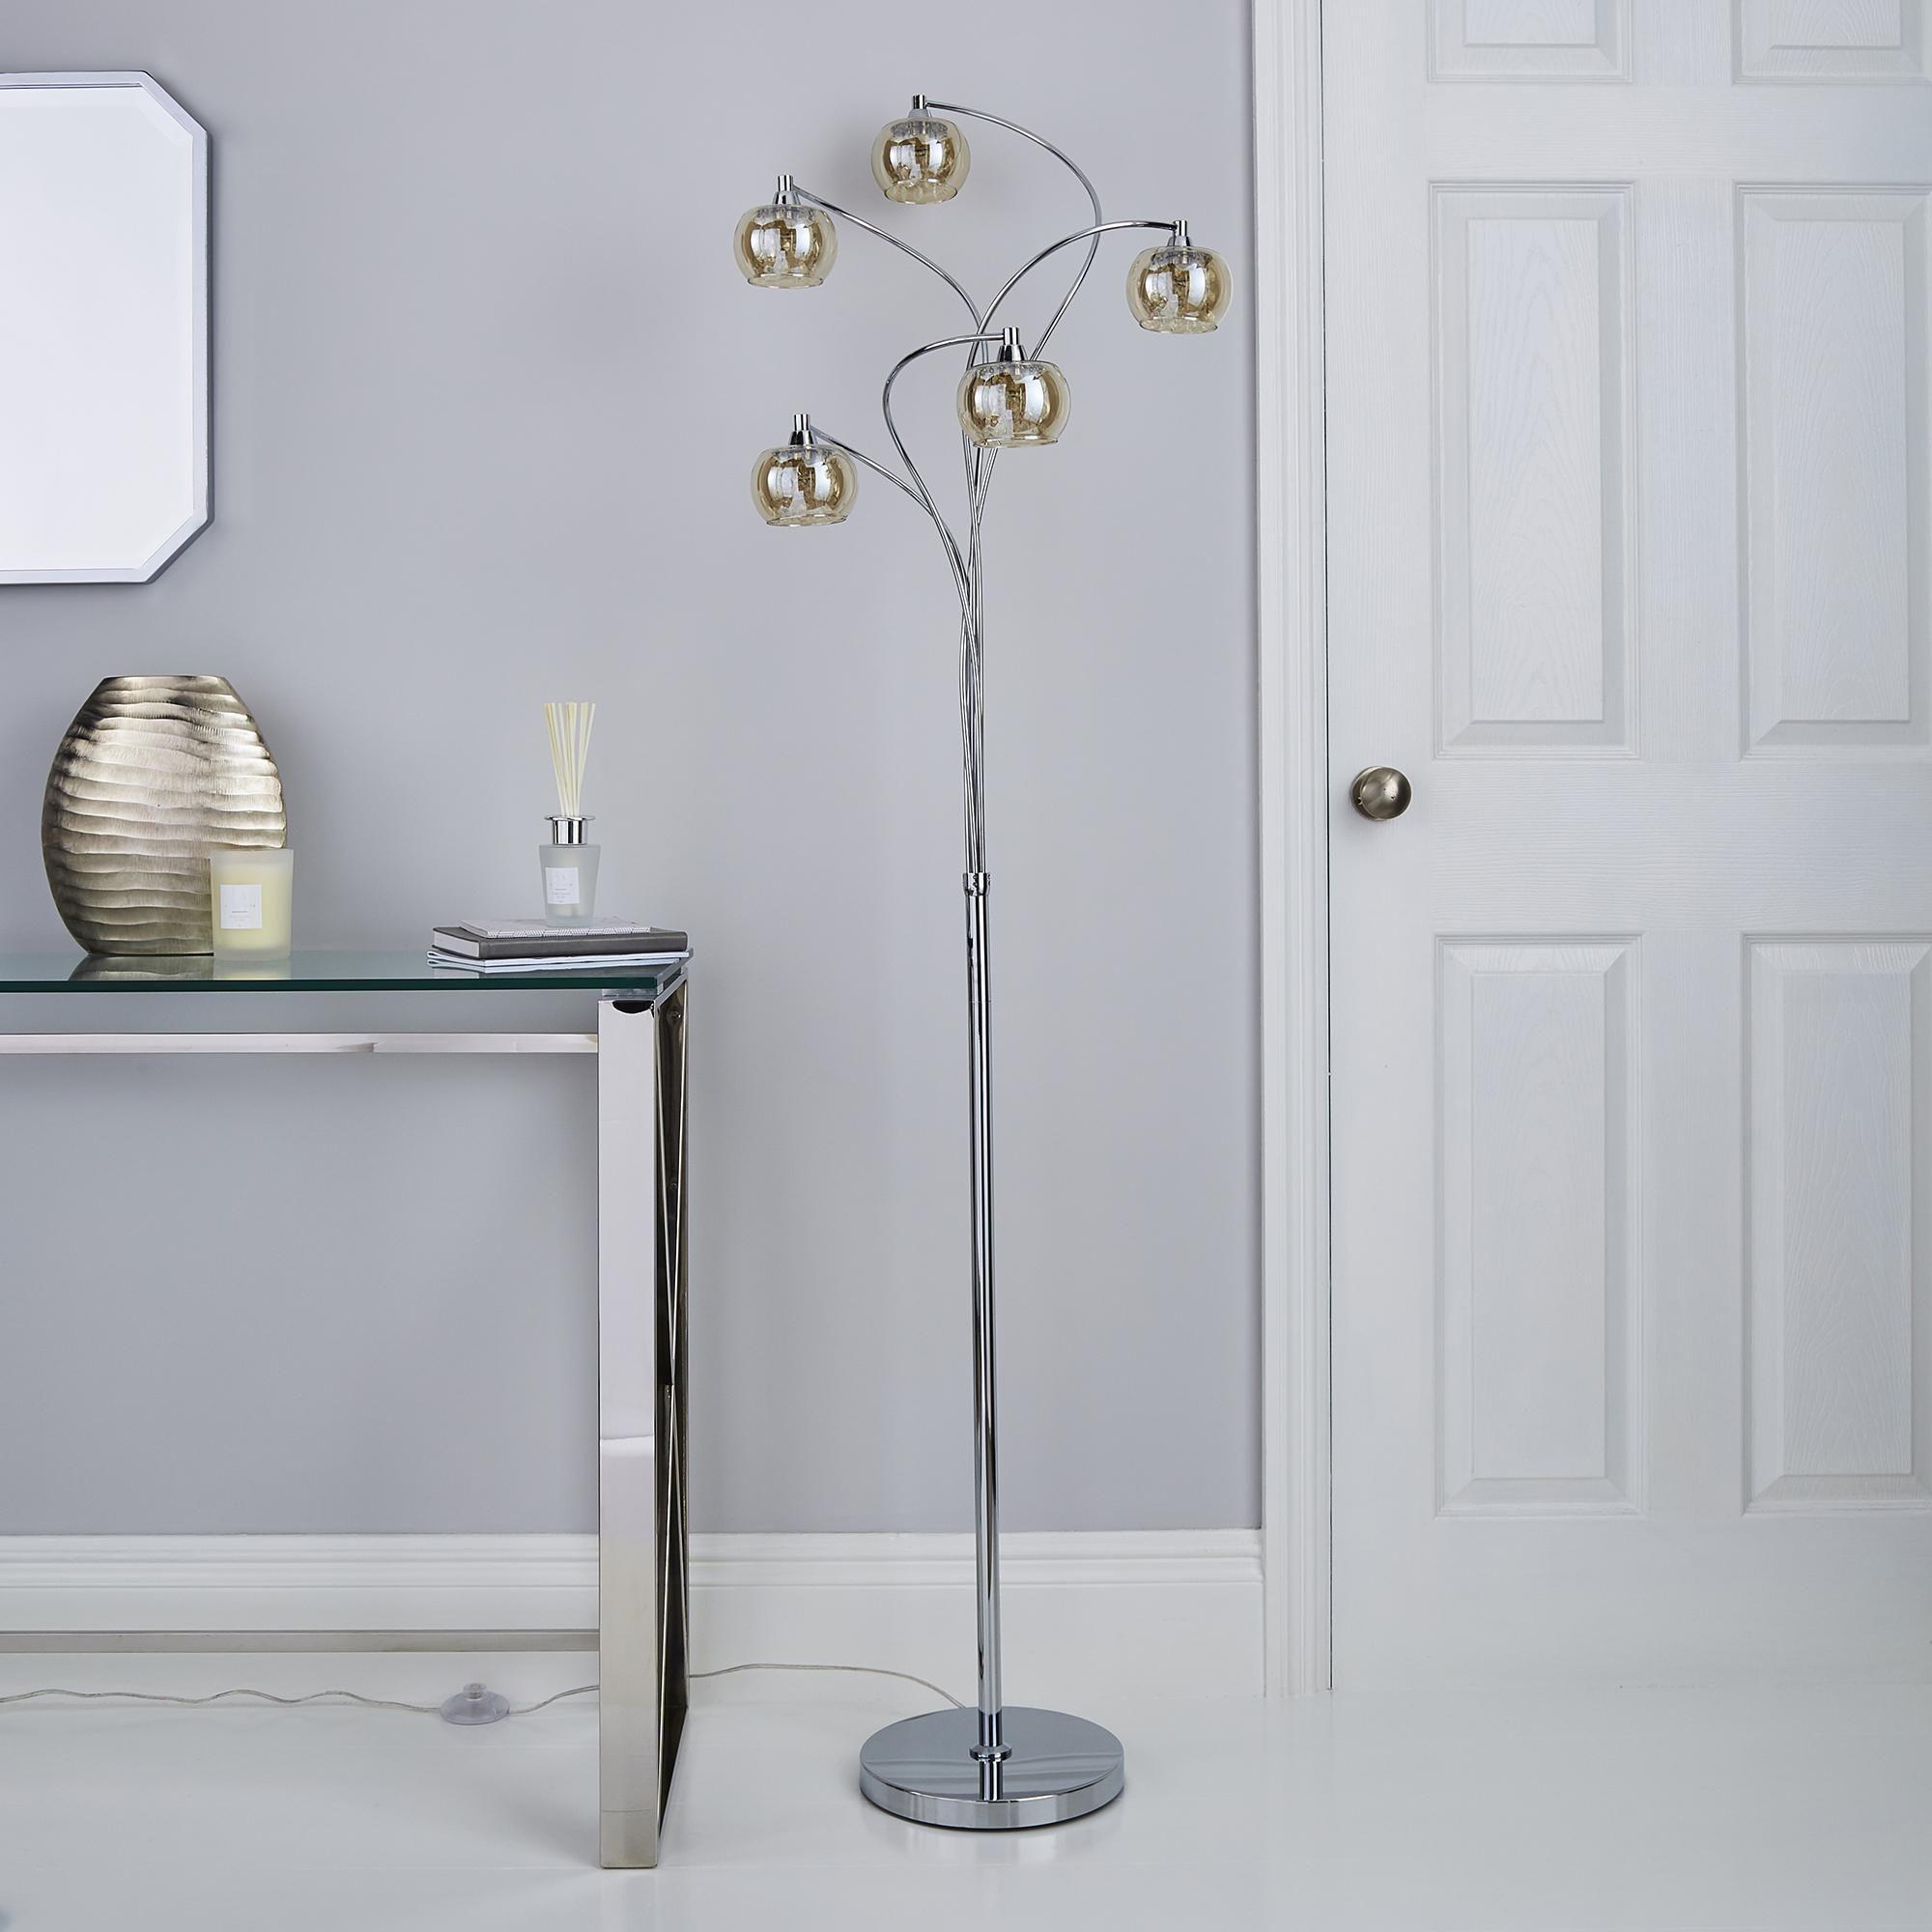 Seychelles 5 Light Smoked Glass Floor Lamp In 2020 5 Light Floor Lamp Floor Lamp Chrome